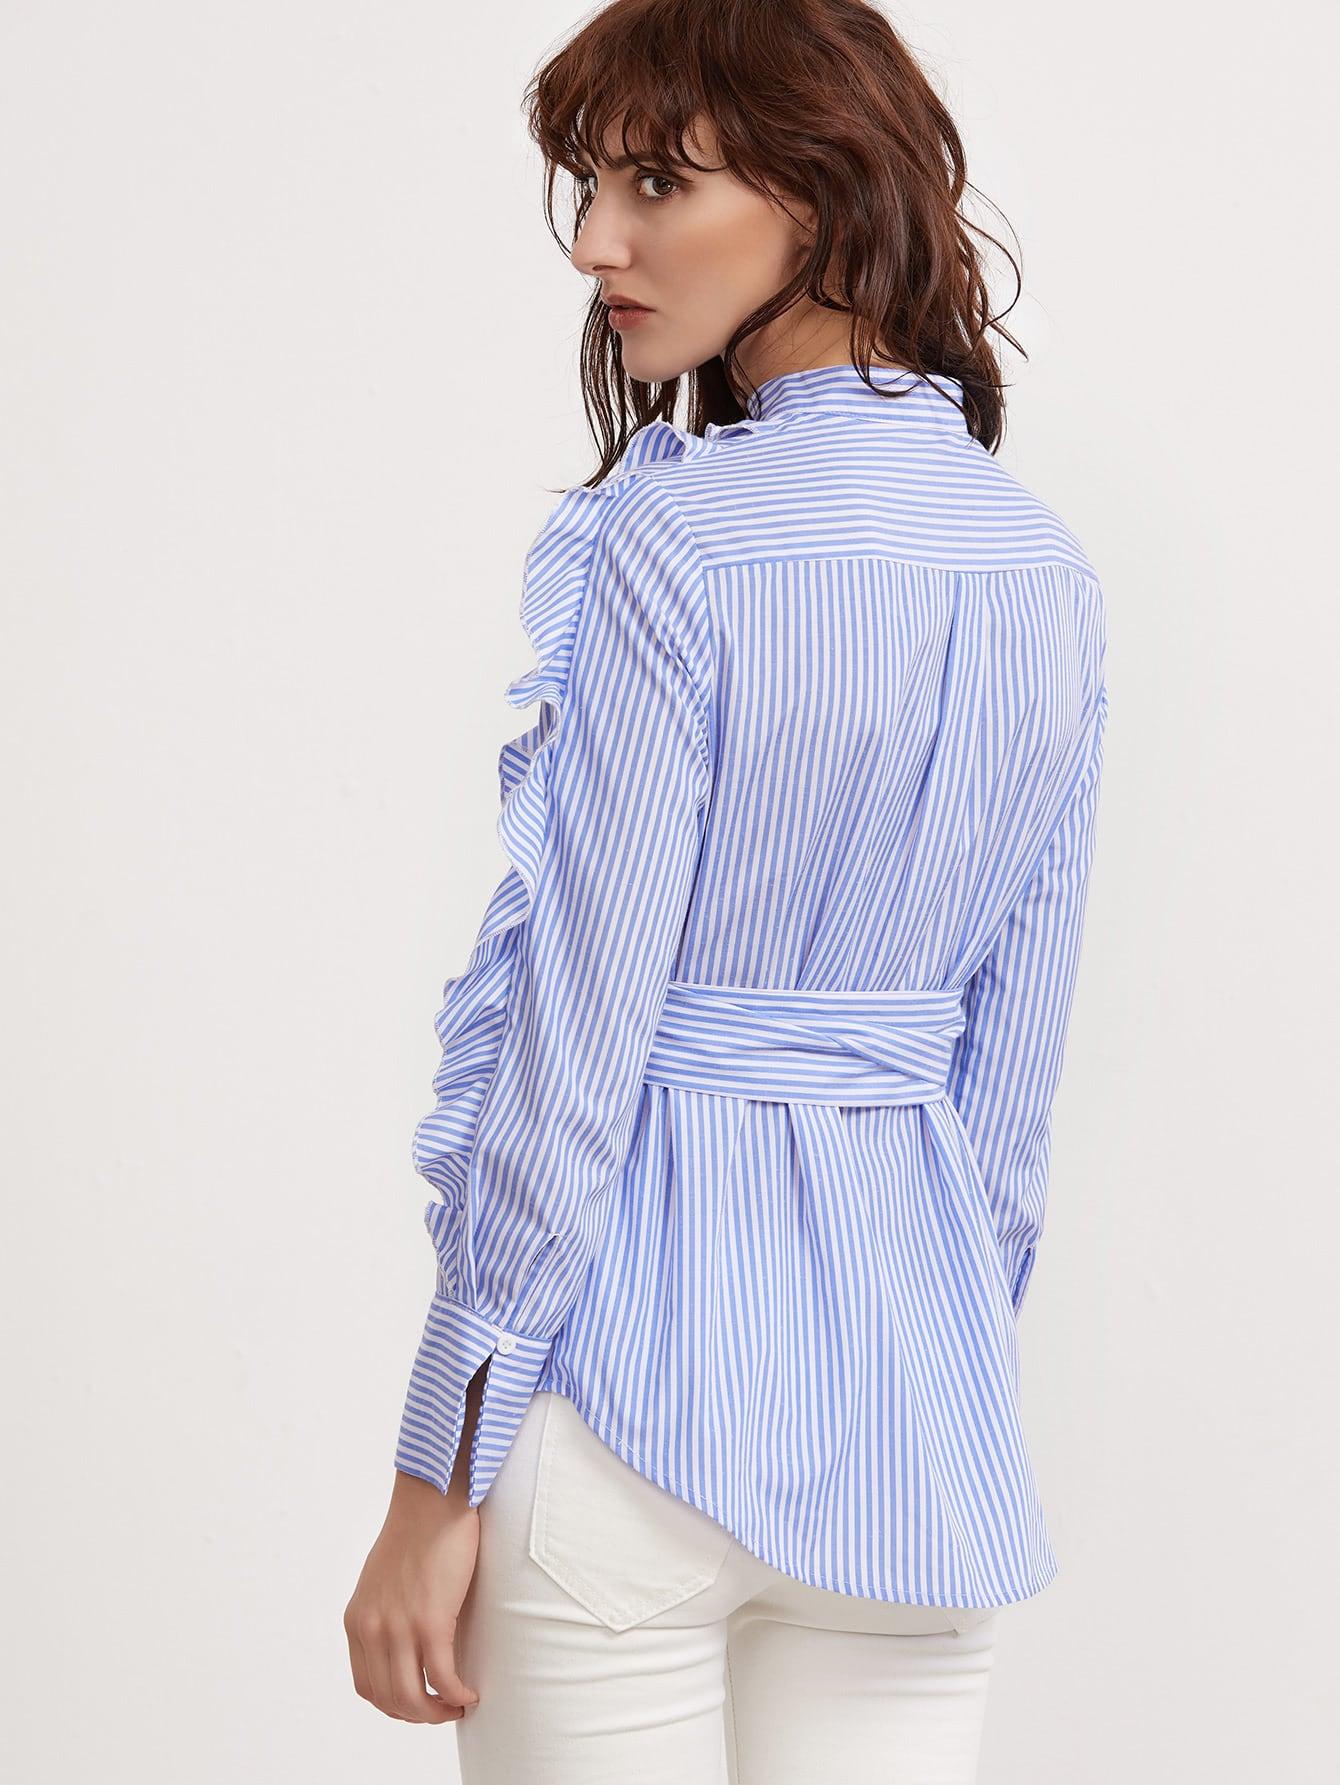 blouse161130725_2